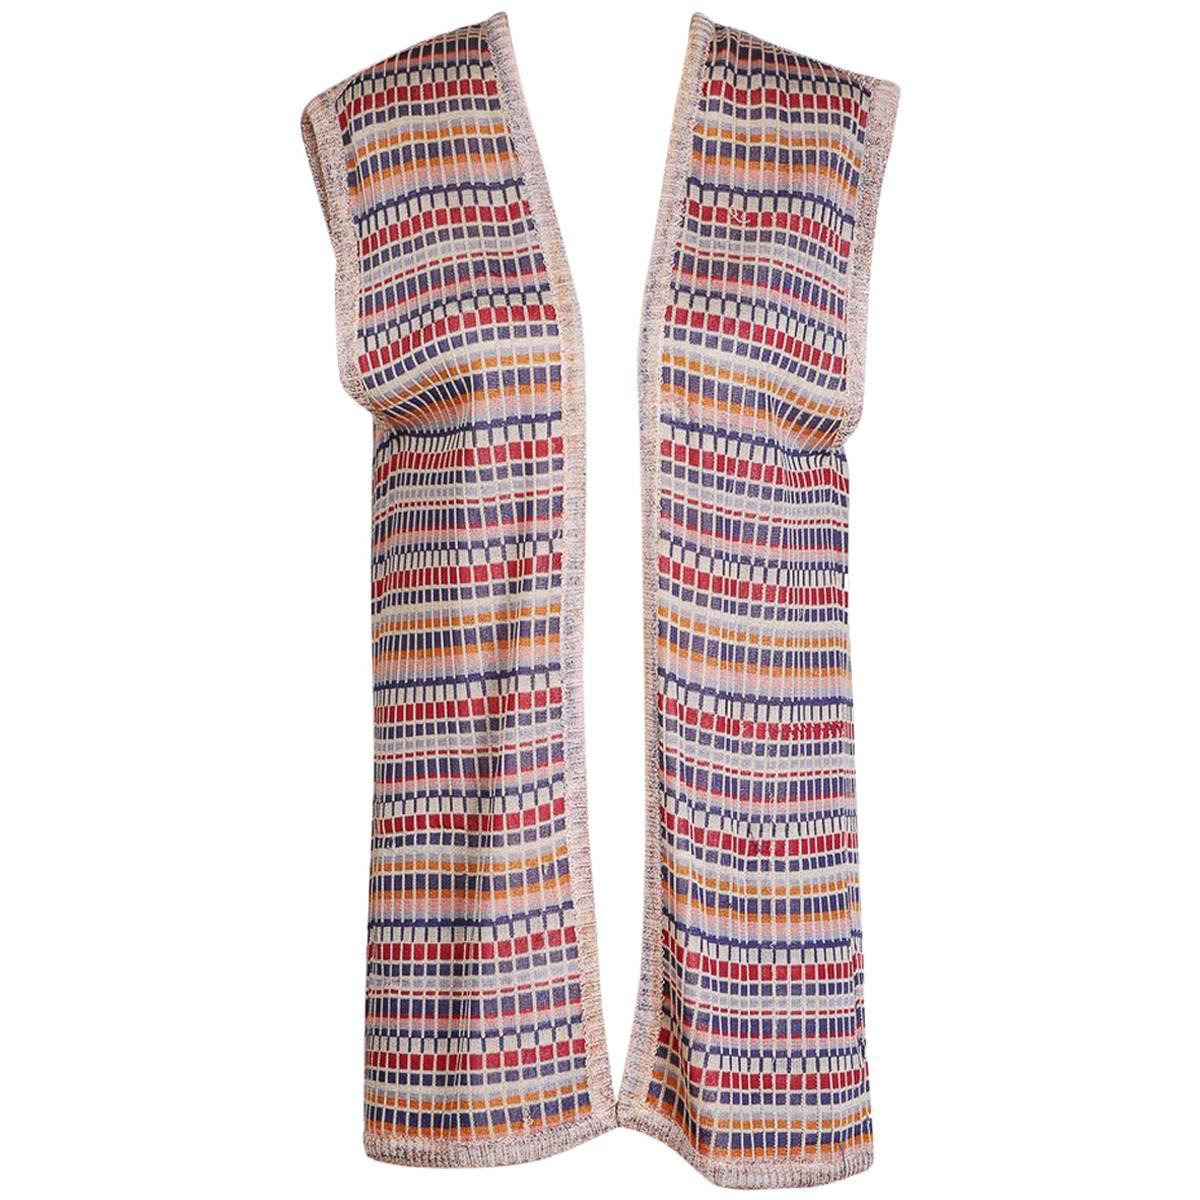 Missoni Vest with Geometric Stripes and Blocks Pattern, circa 1970s